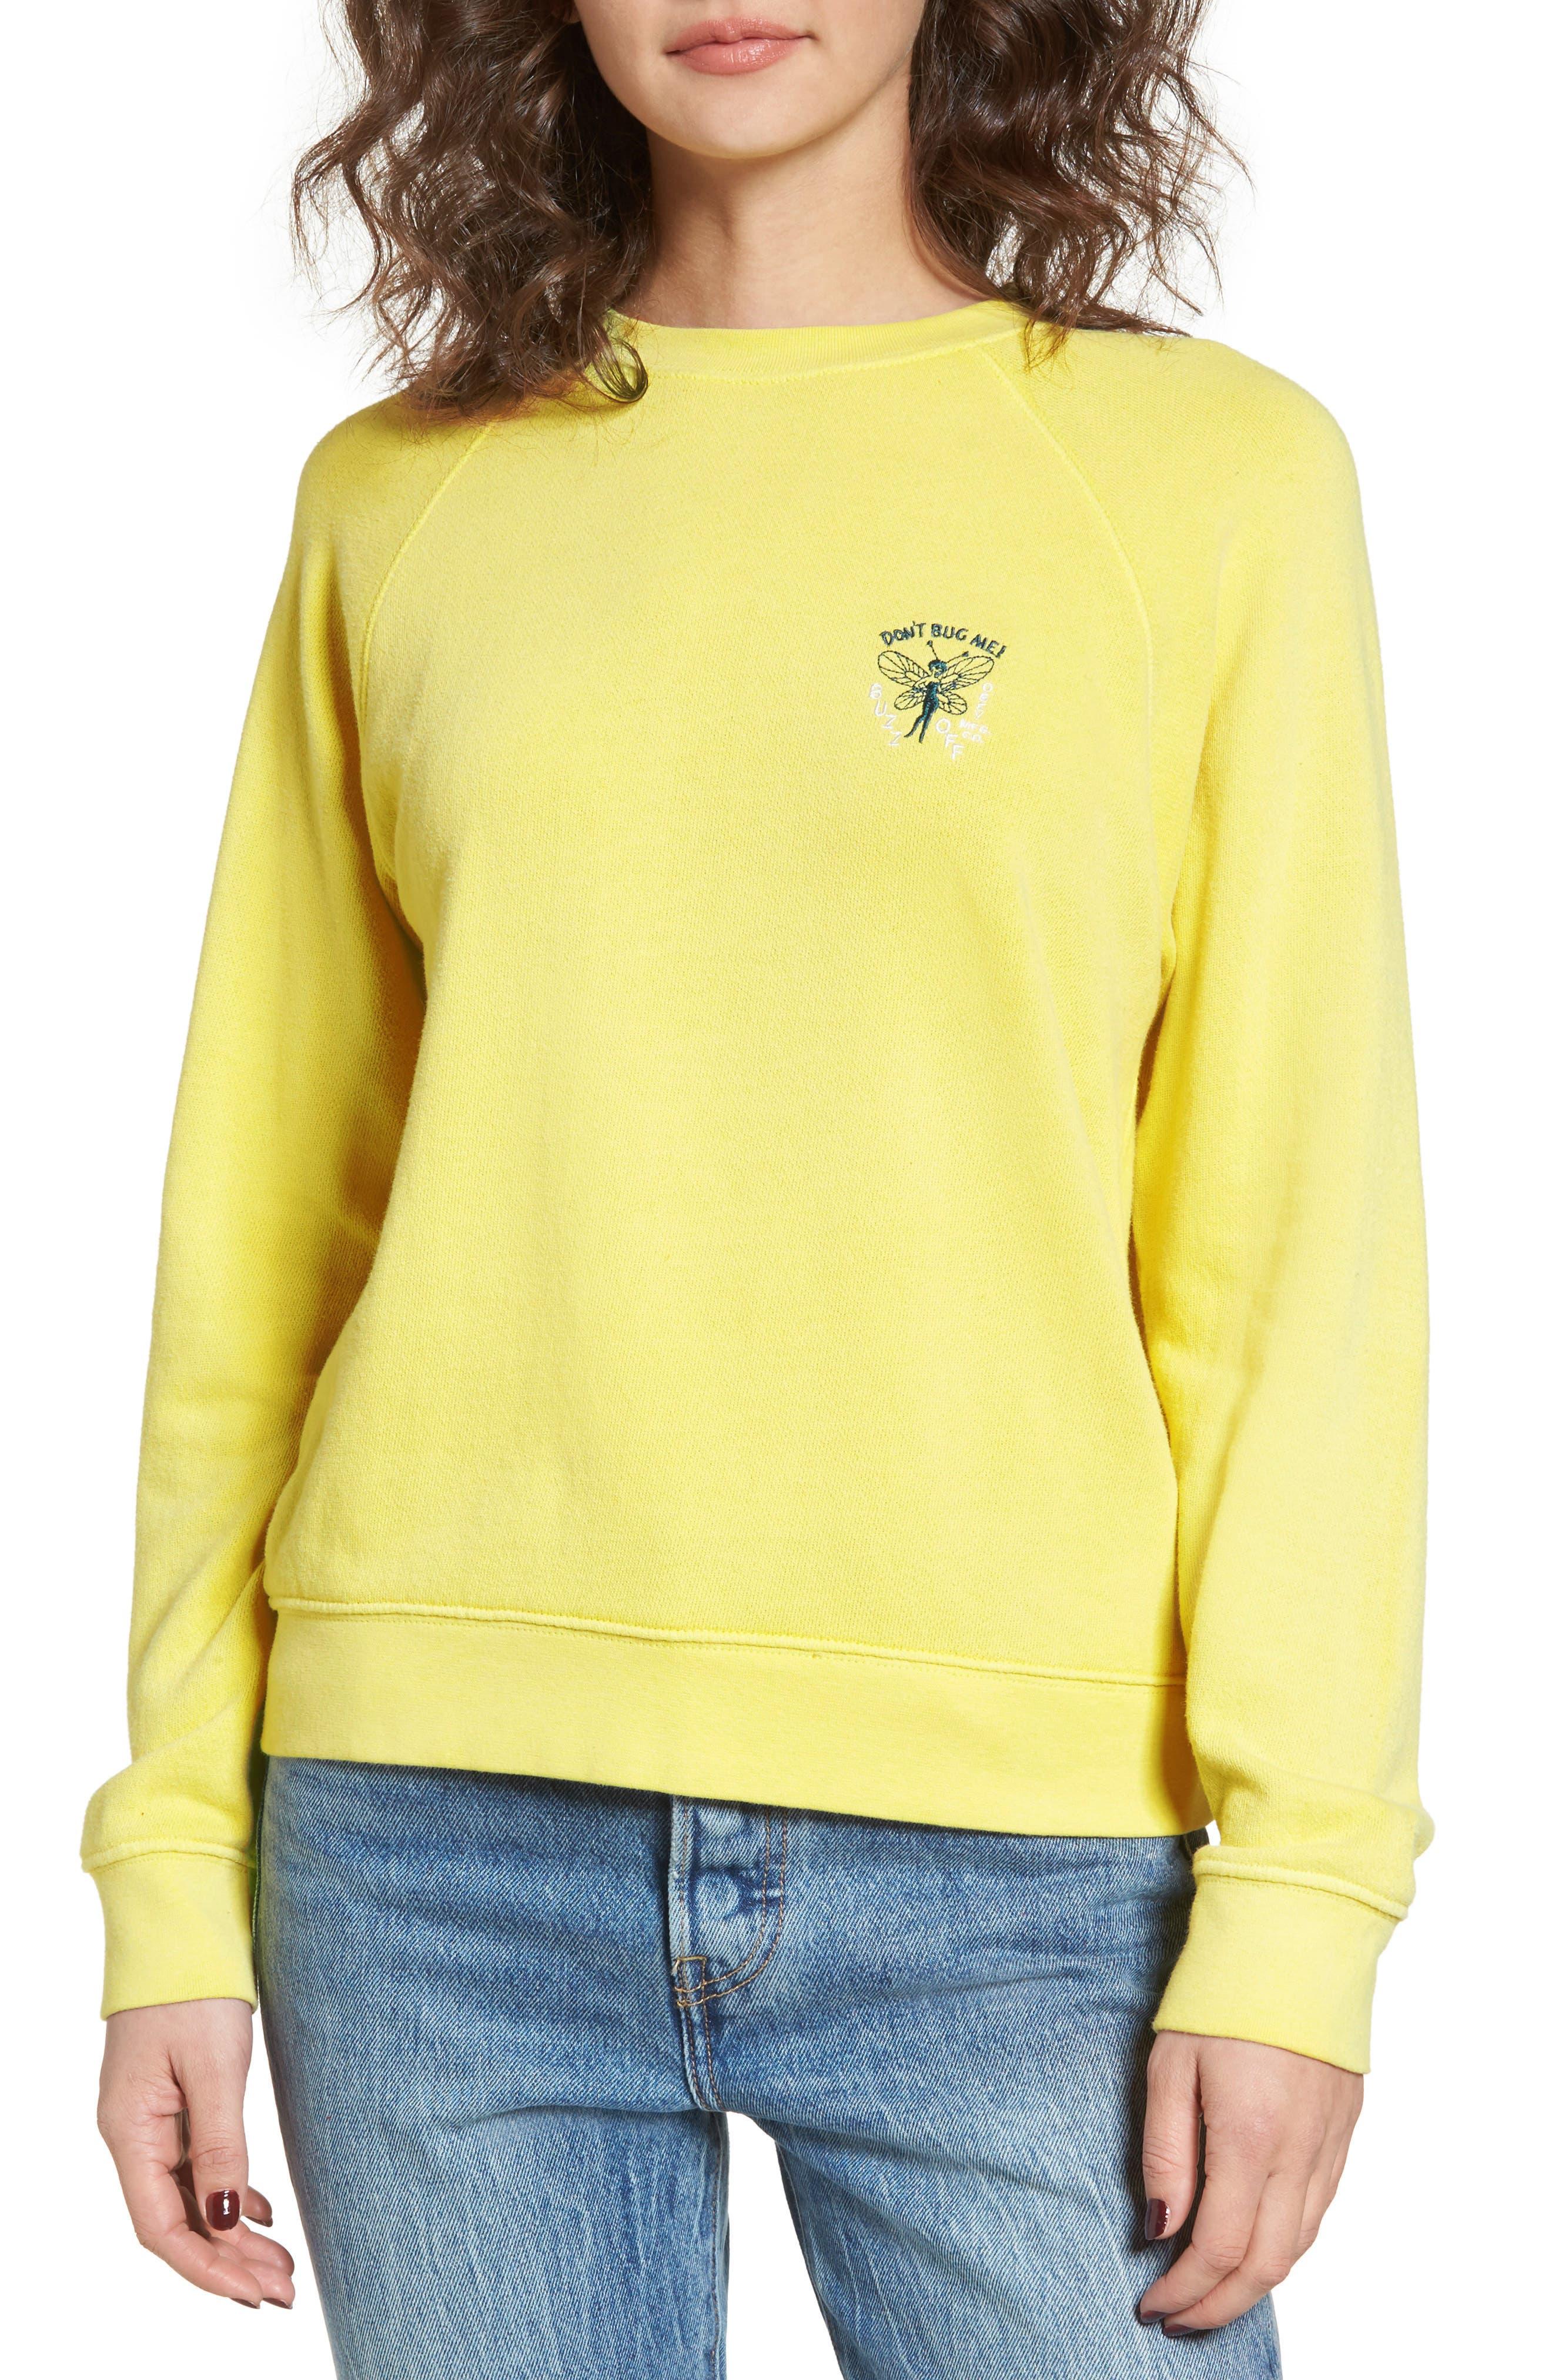 Portola Crew Sweatshirt,                             Main thumbnail 1, color,                             750